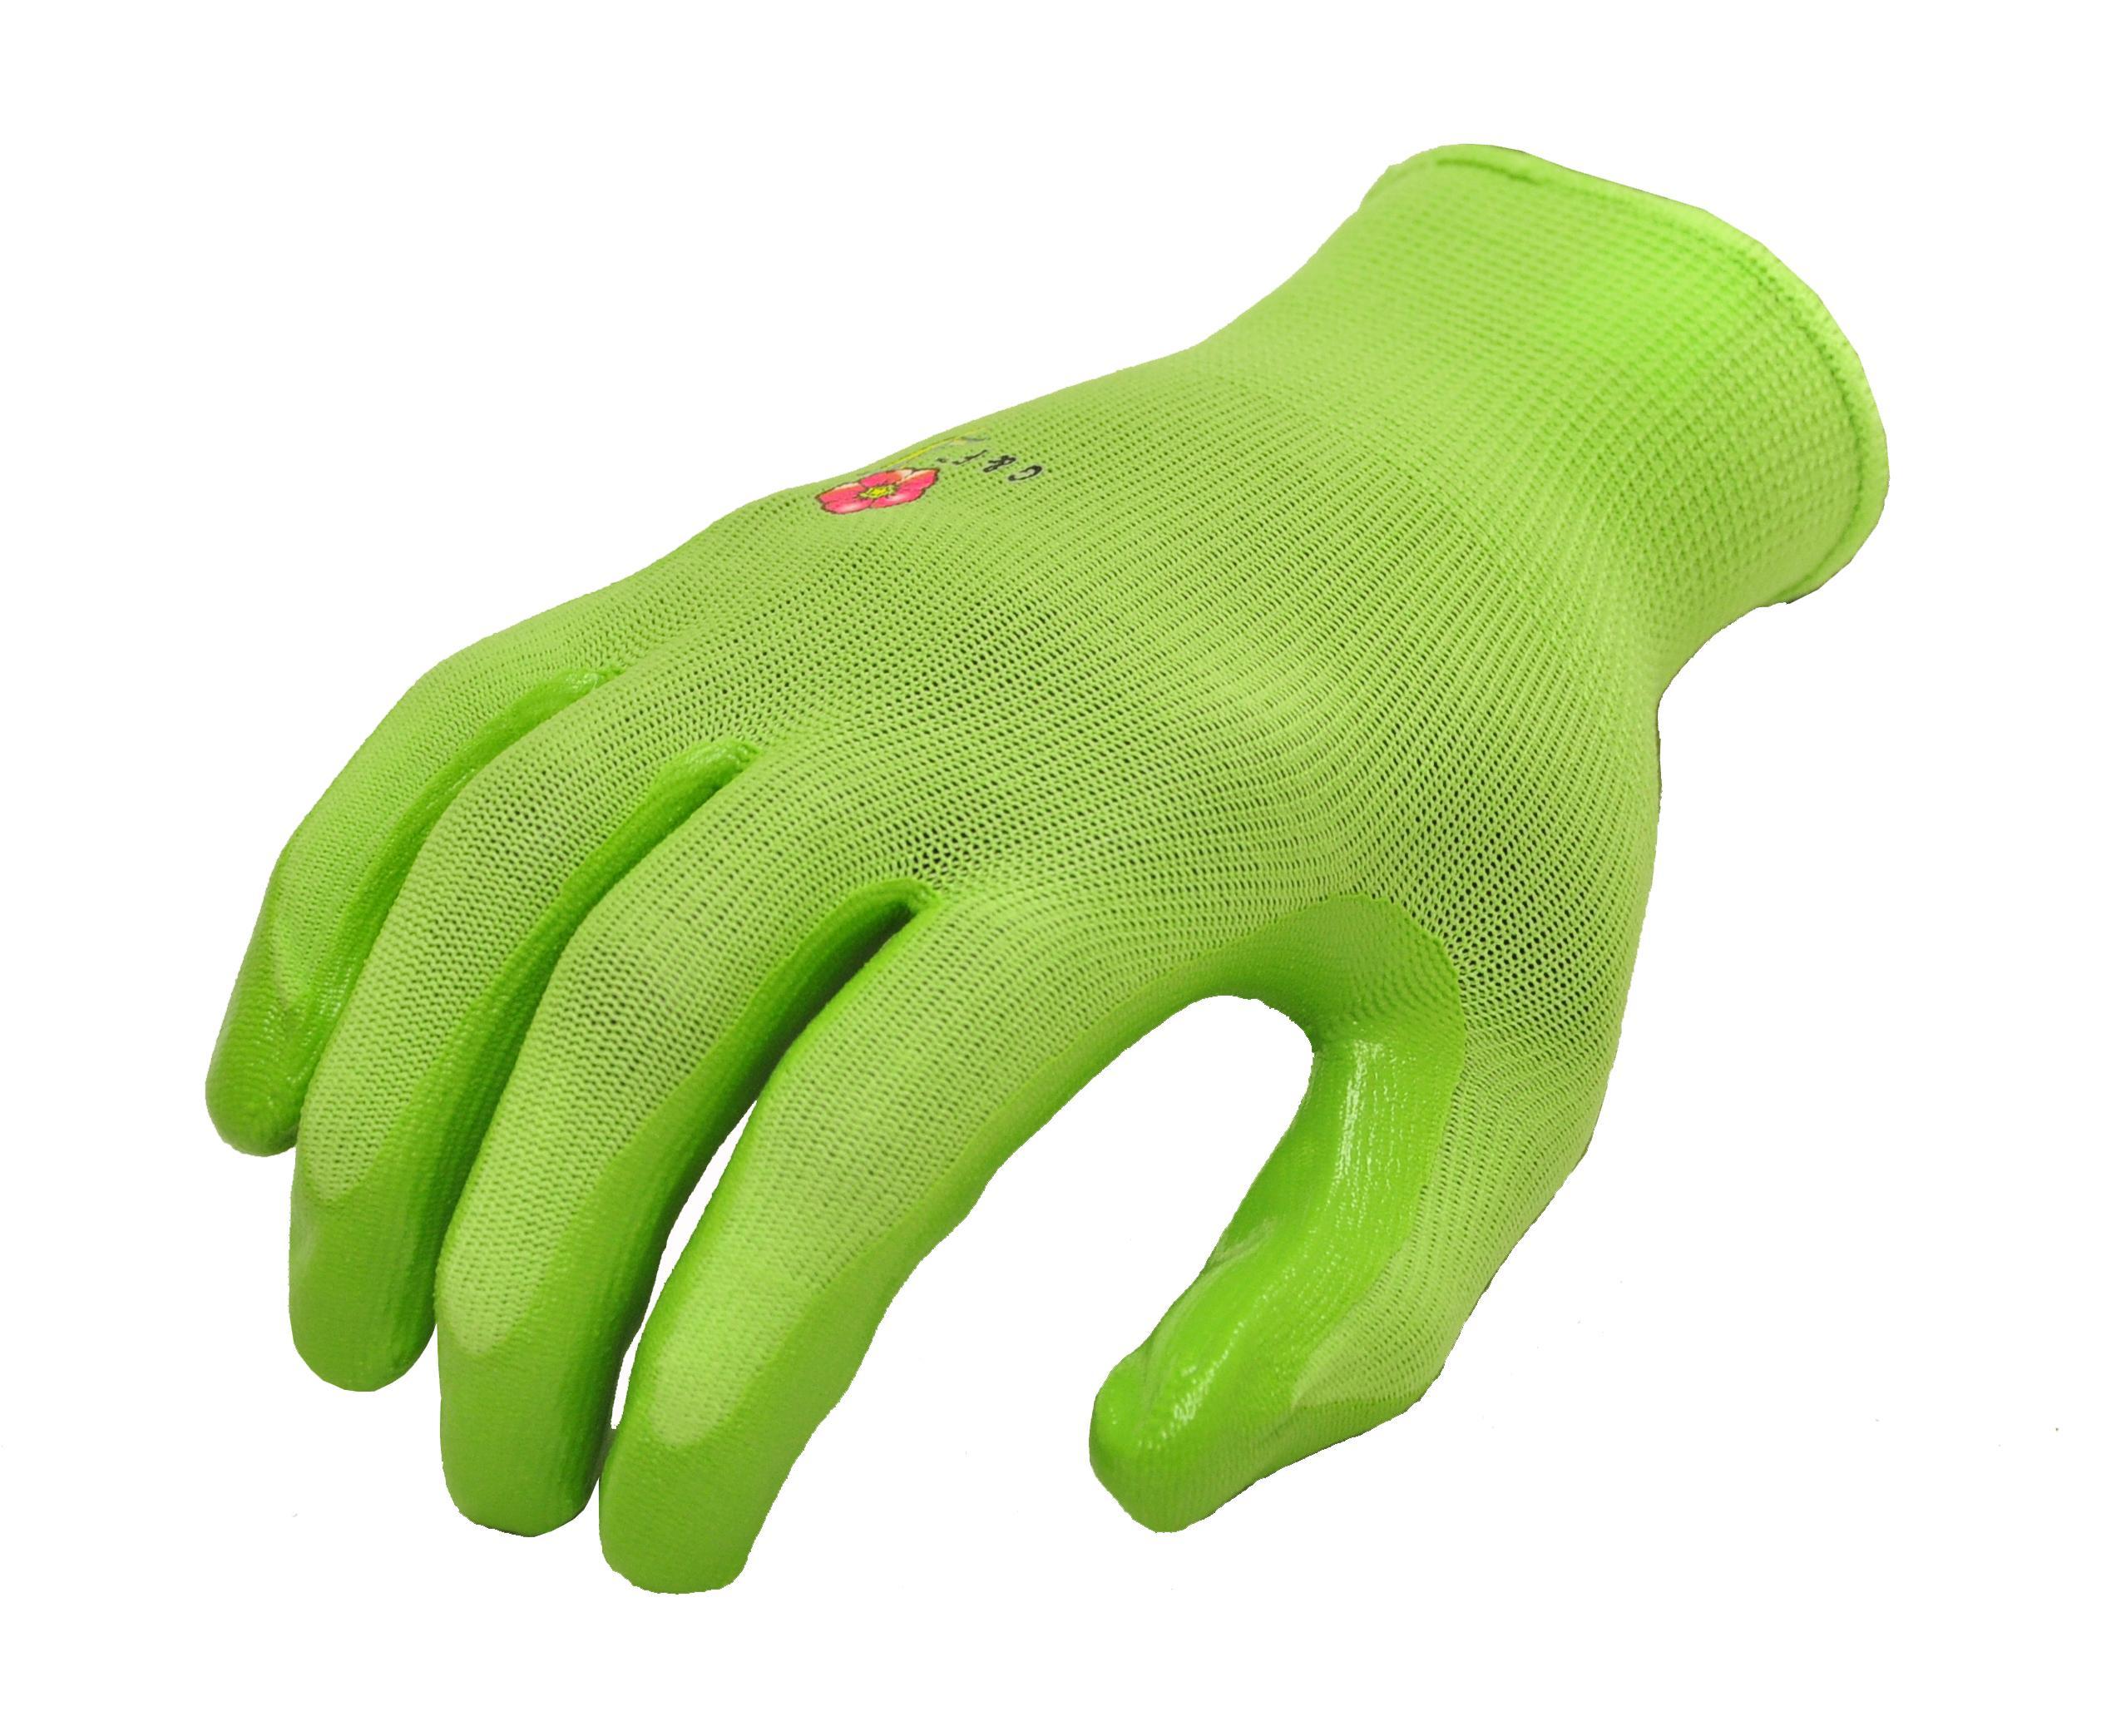 Womens Garden Gloves 6 Pair Pack assorted colors Women